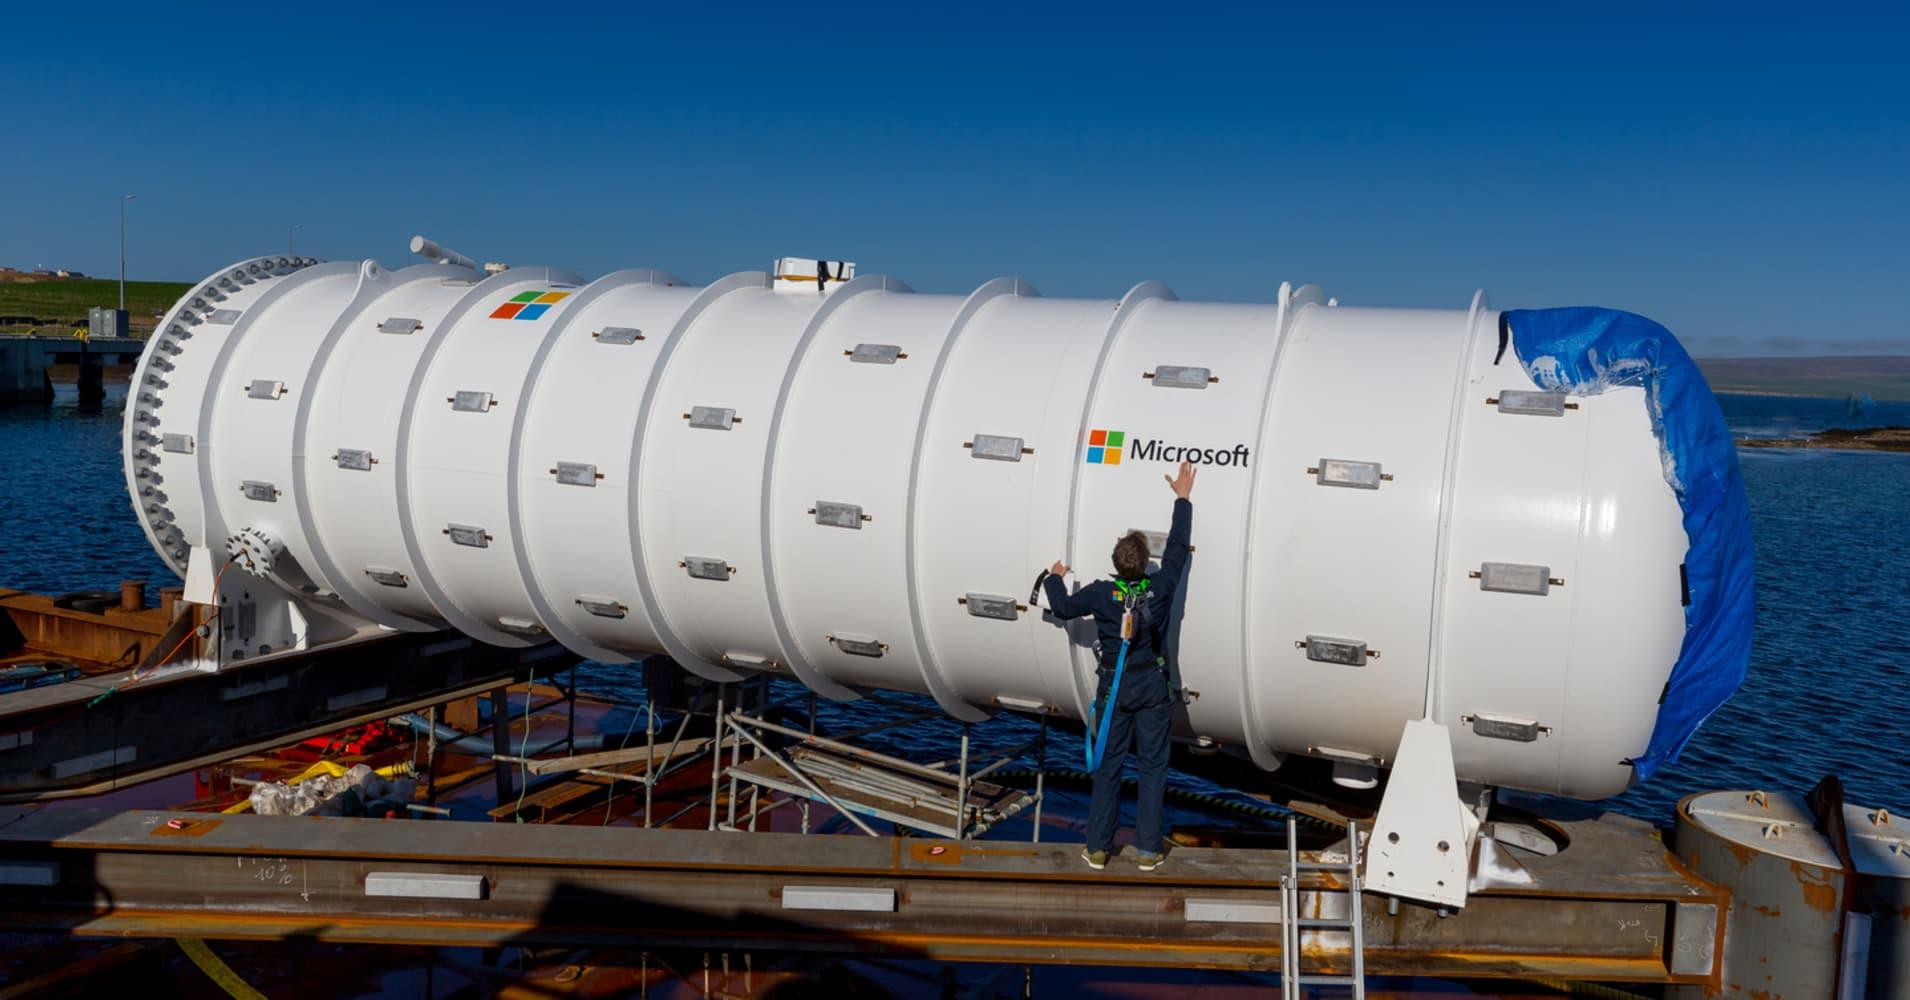 Microsoft deploys an underwater submarine-like data center to boost internet speeds